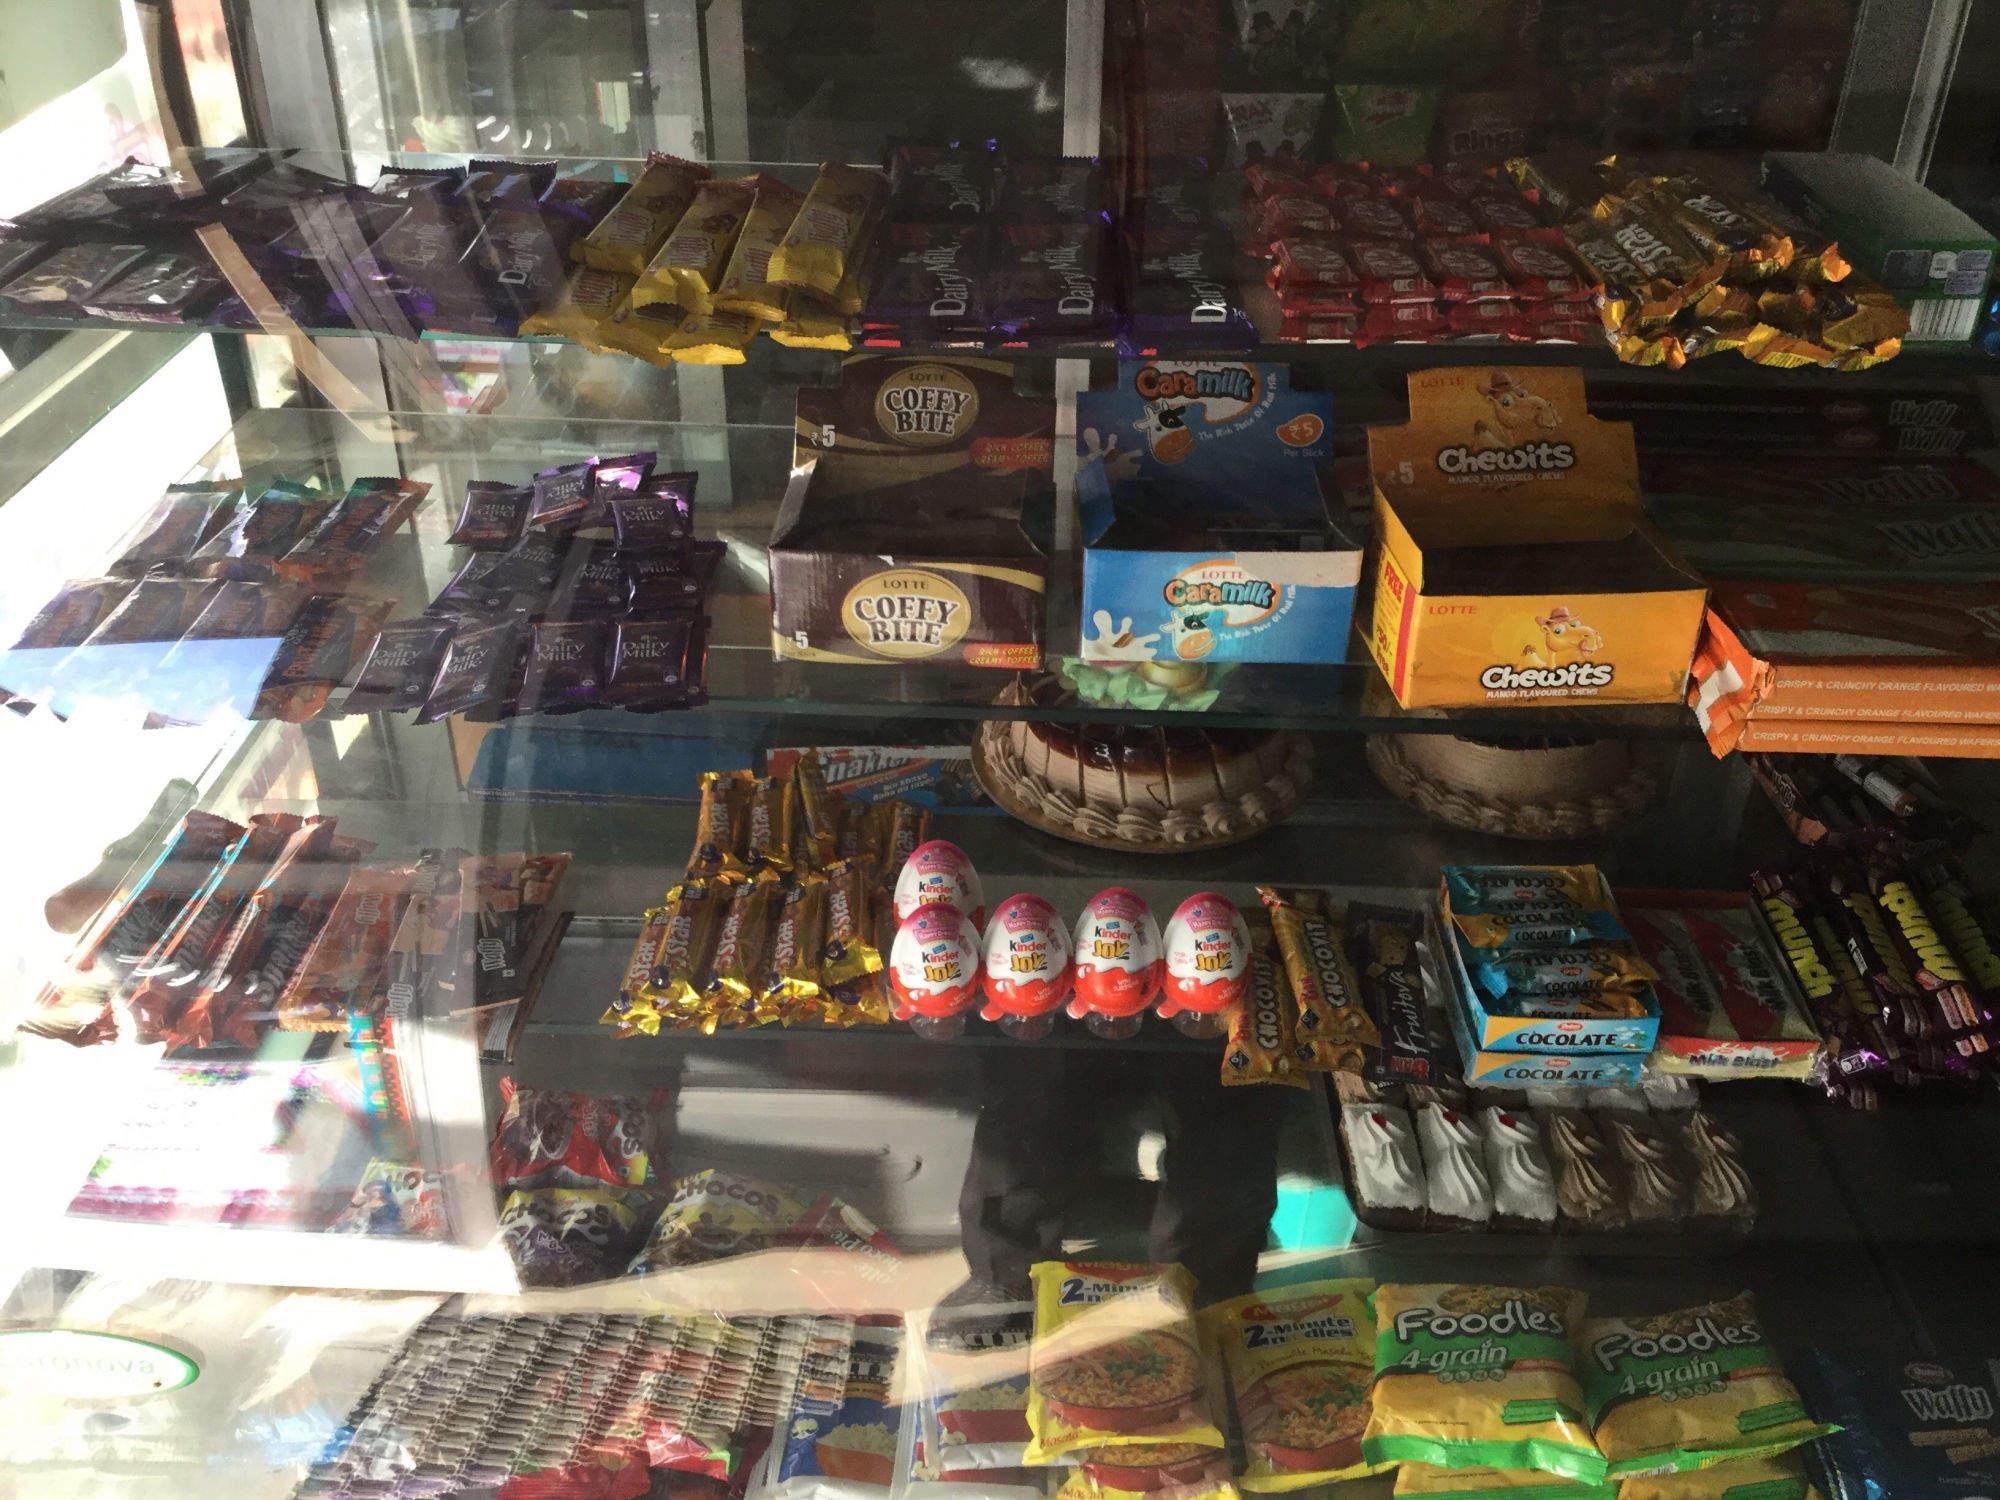 Top Ice Cream Parlours in Najafgarh - Best Famous Ice Cream Parlours